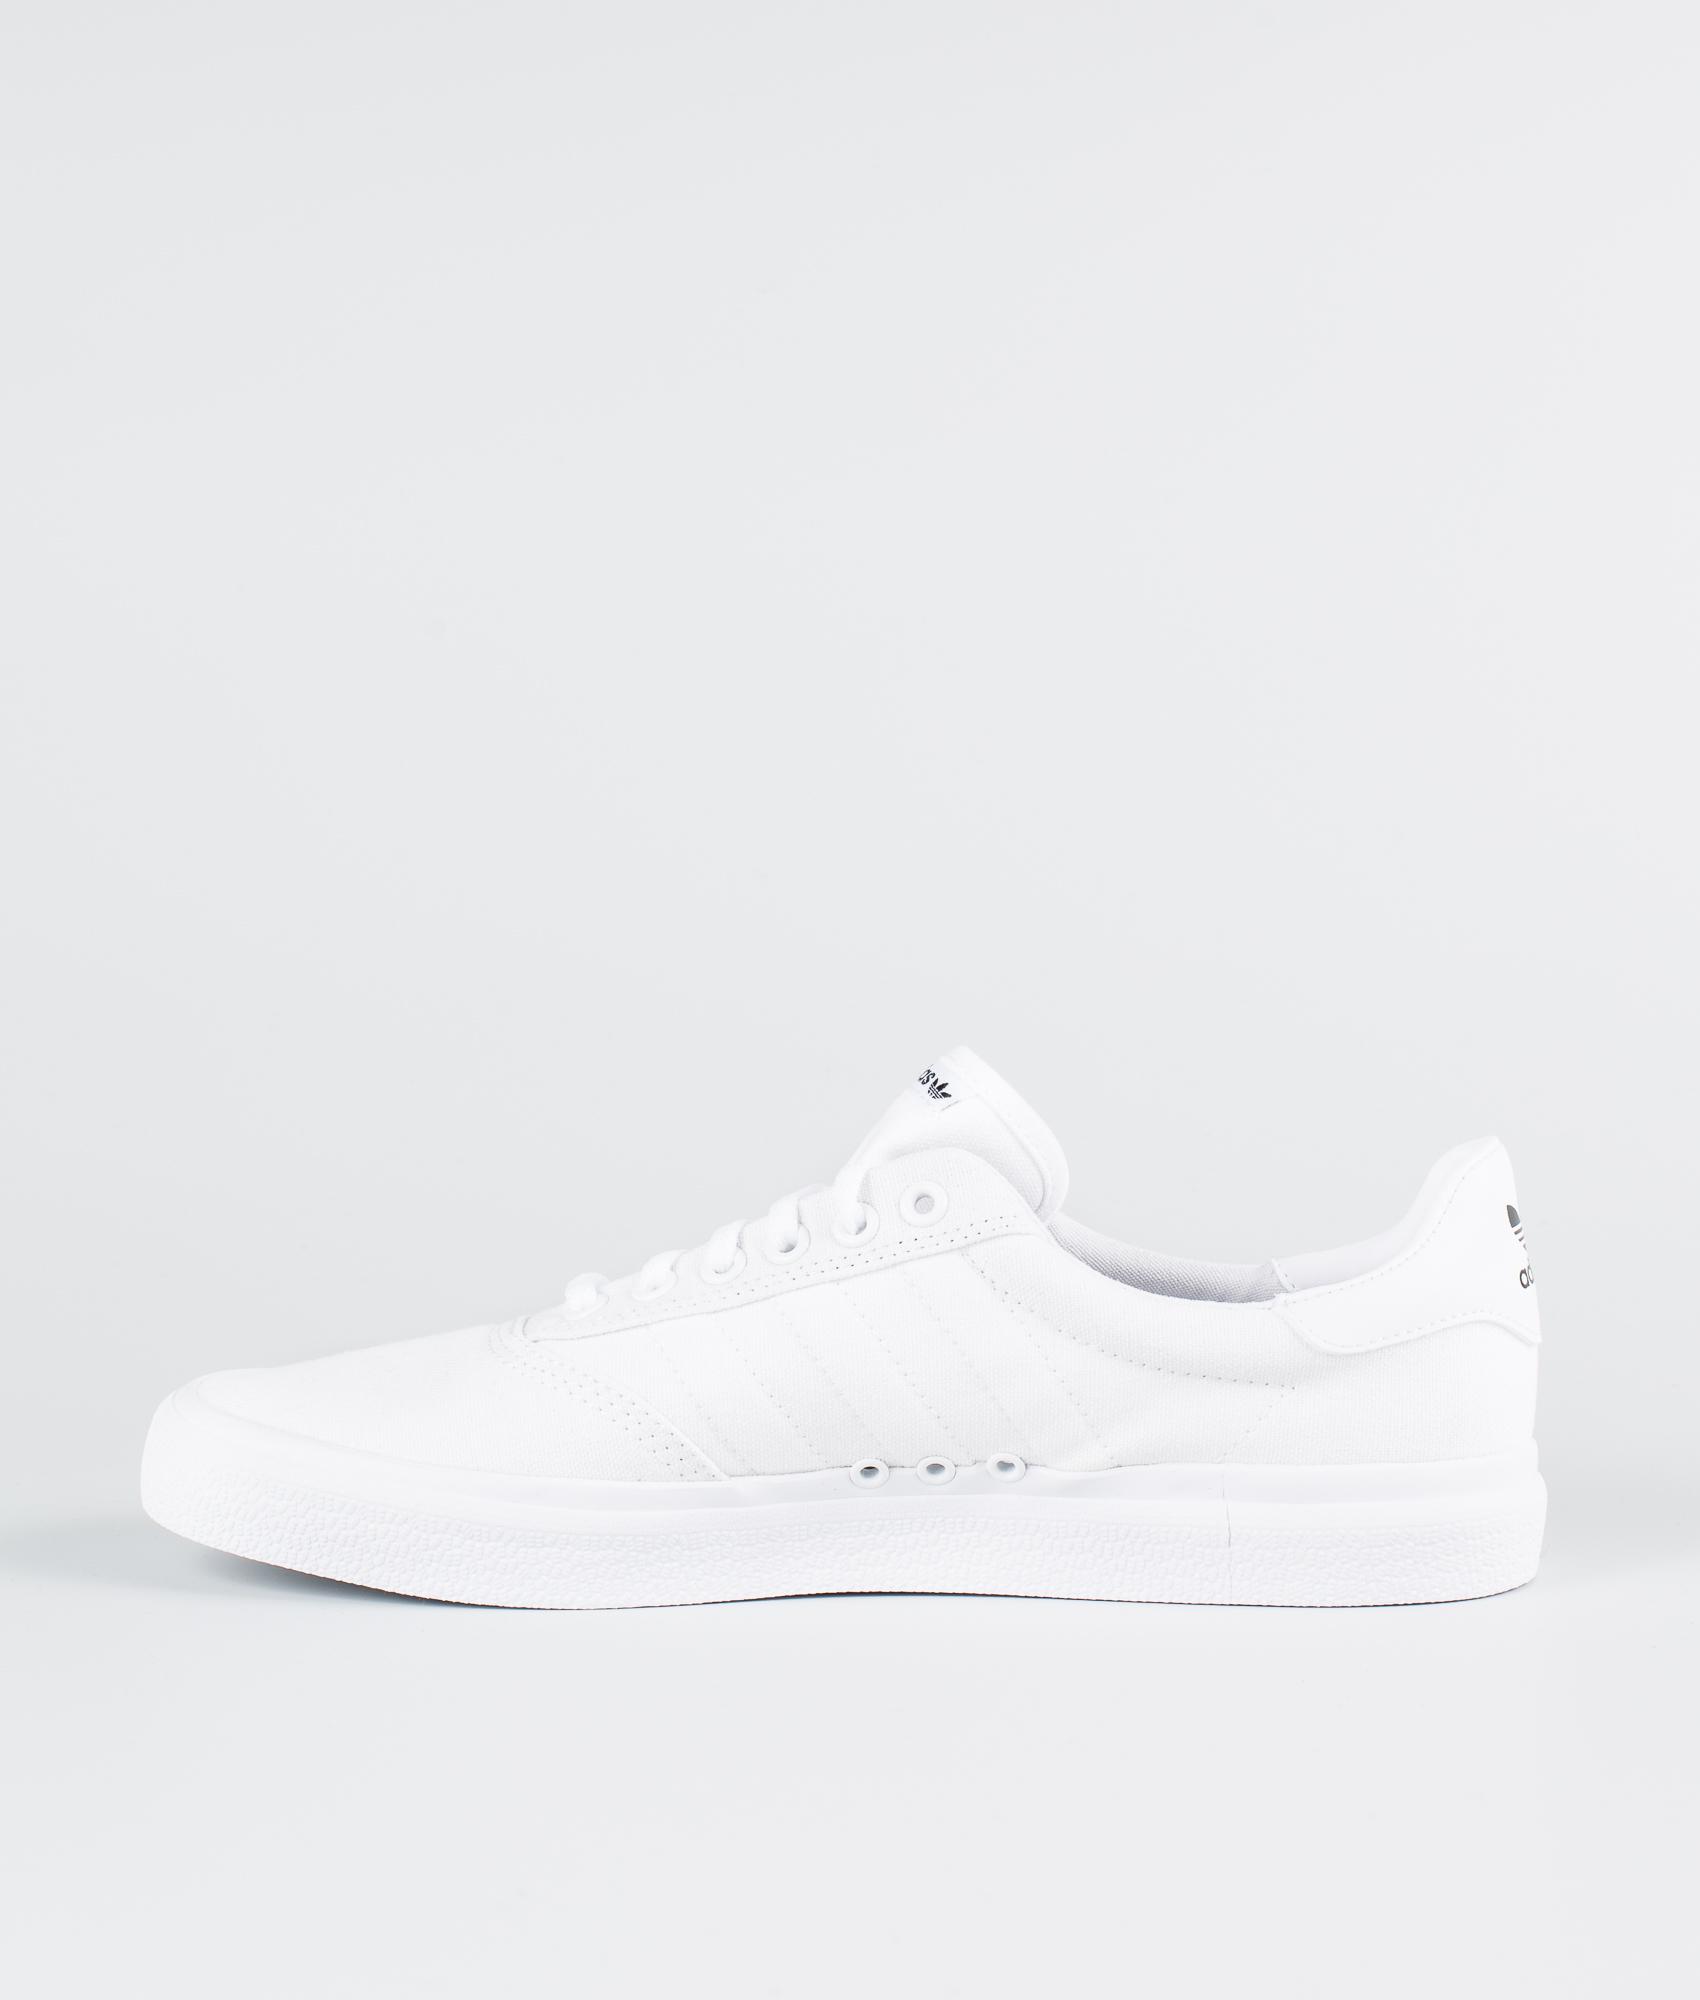 Adidas Skateboarding 3Mc Schuhe Ftwr WhiteFtwr WhiteMetallic Gold